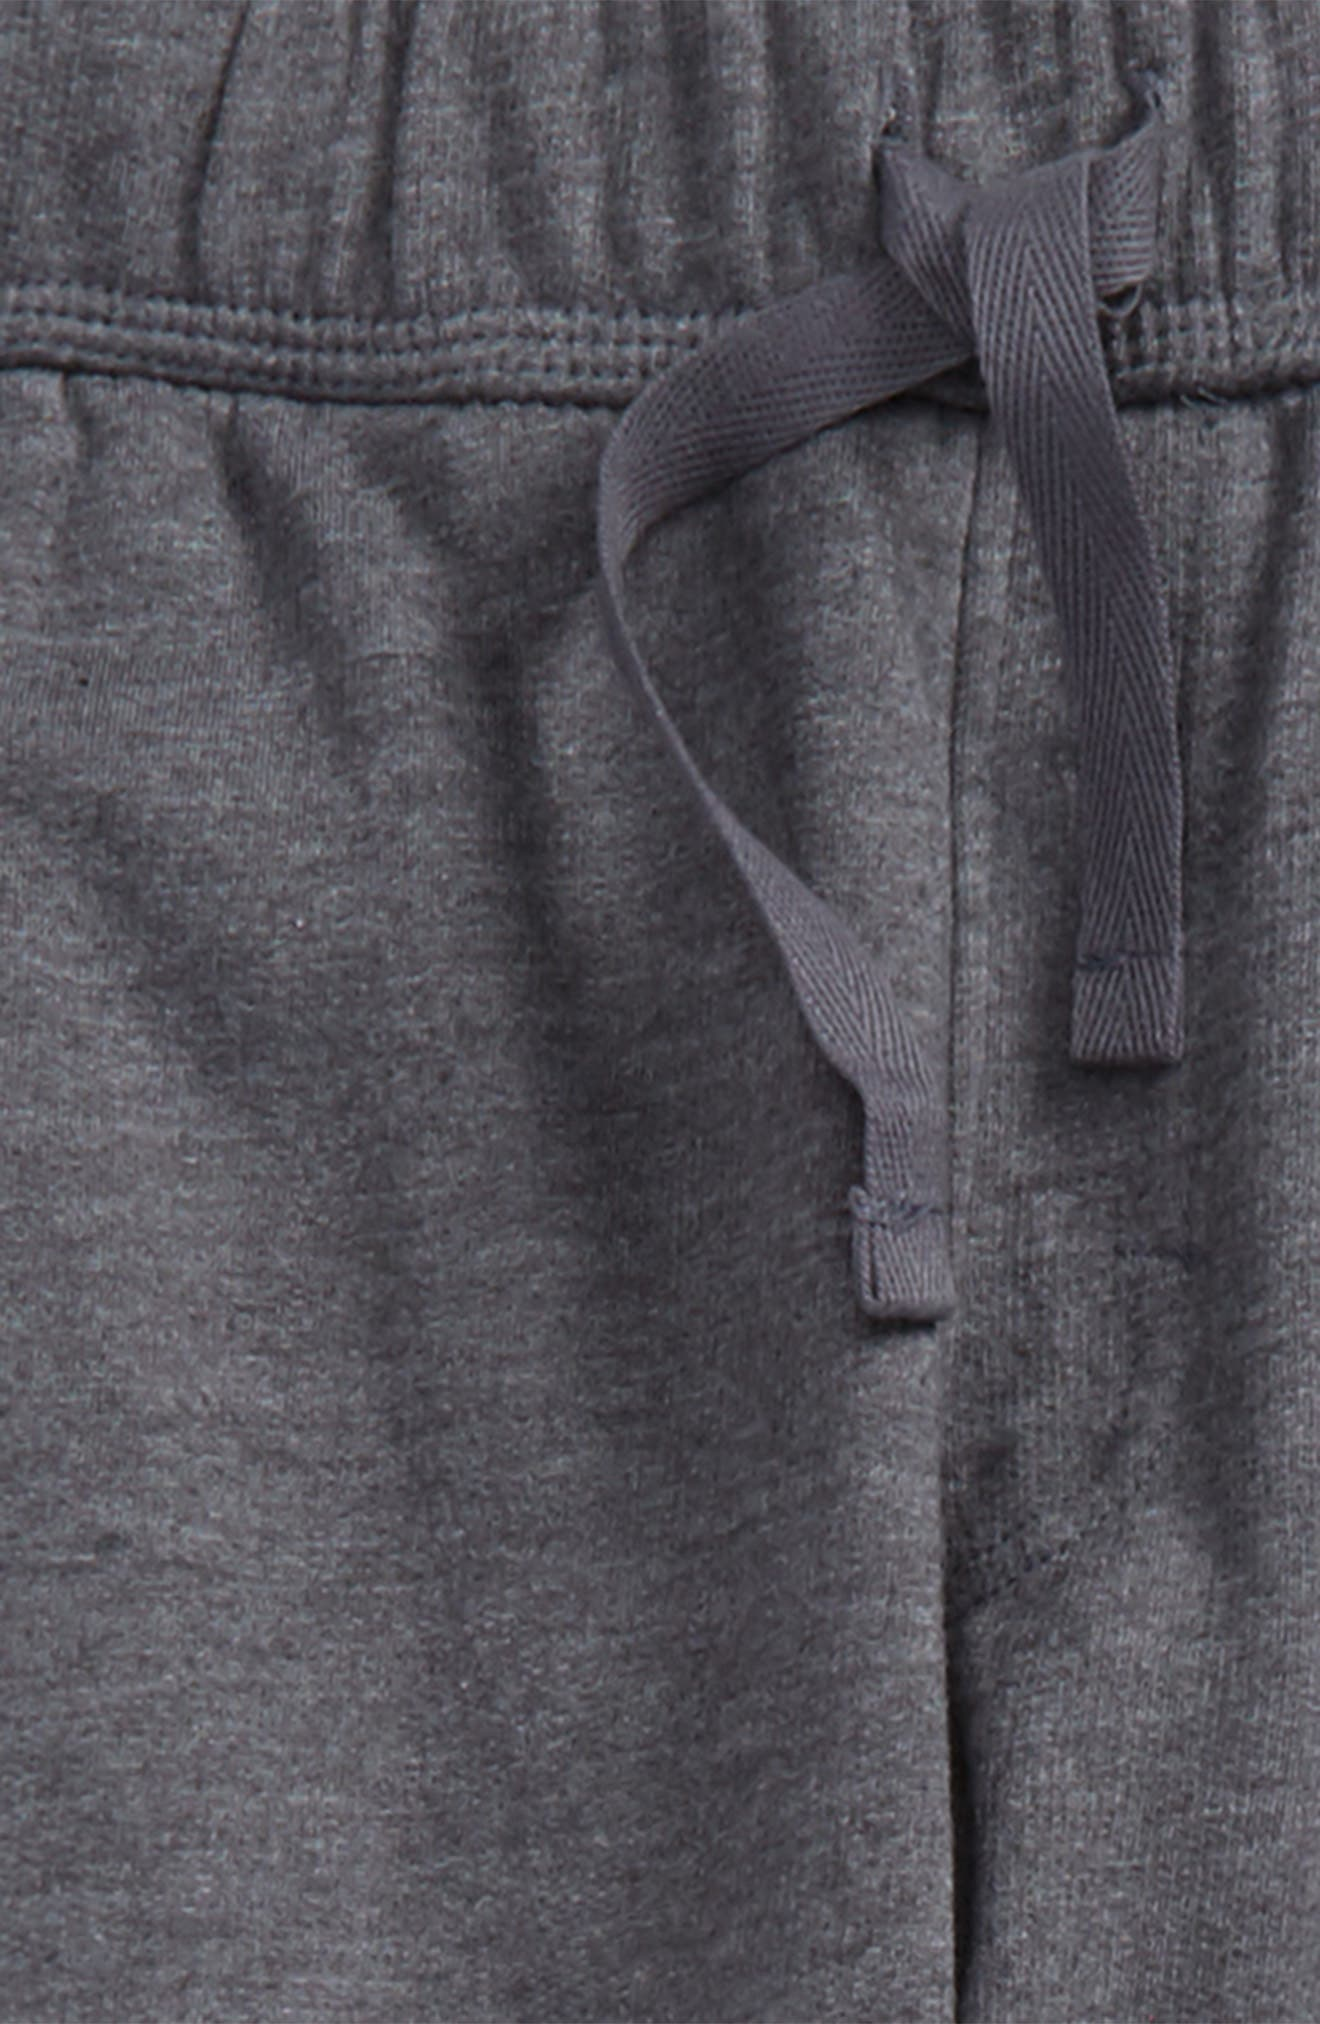 Knit Jogger Pants,                             Alternate thumbnail 2, color,                             Grey Charcoal Heather